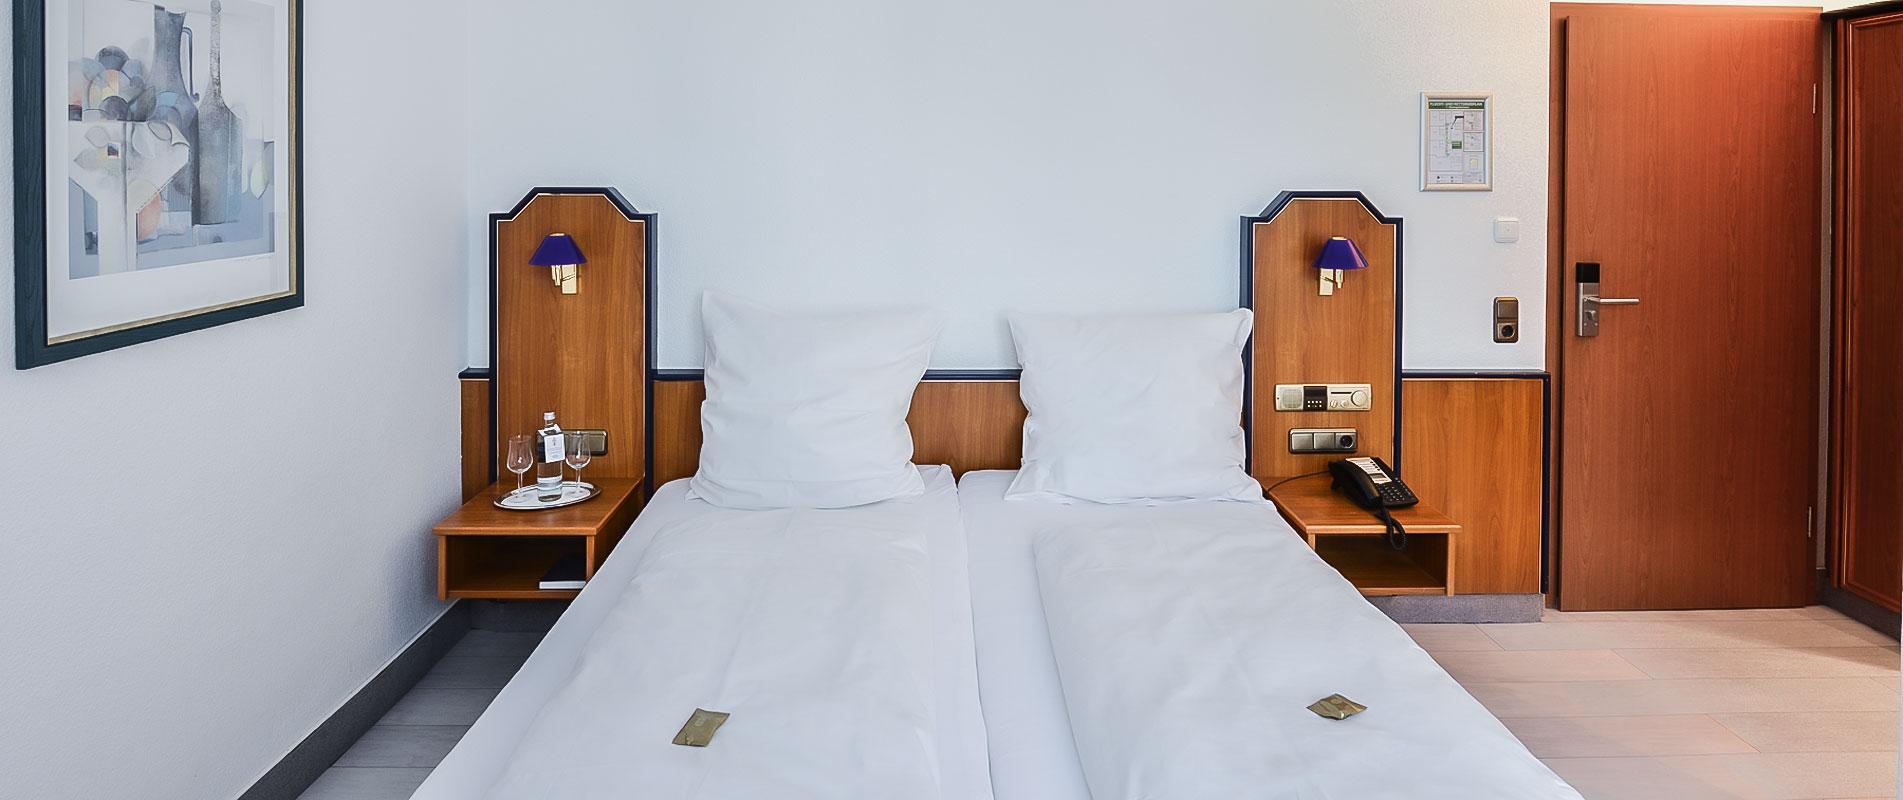 © Hotel Tillmanns / Foto Hermann Heibel